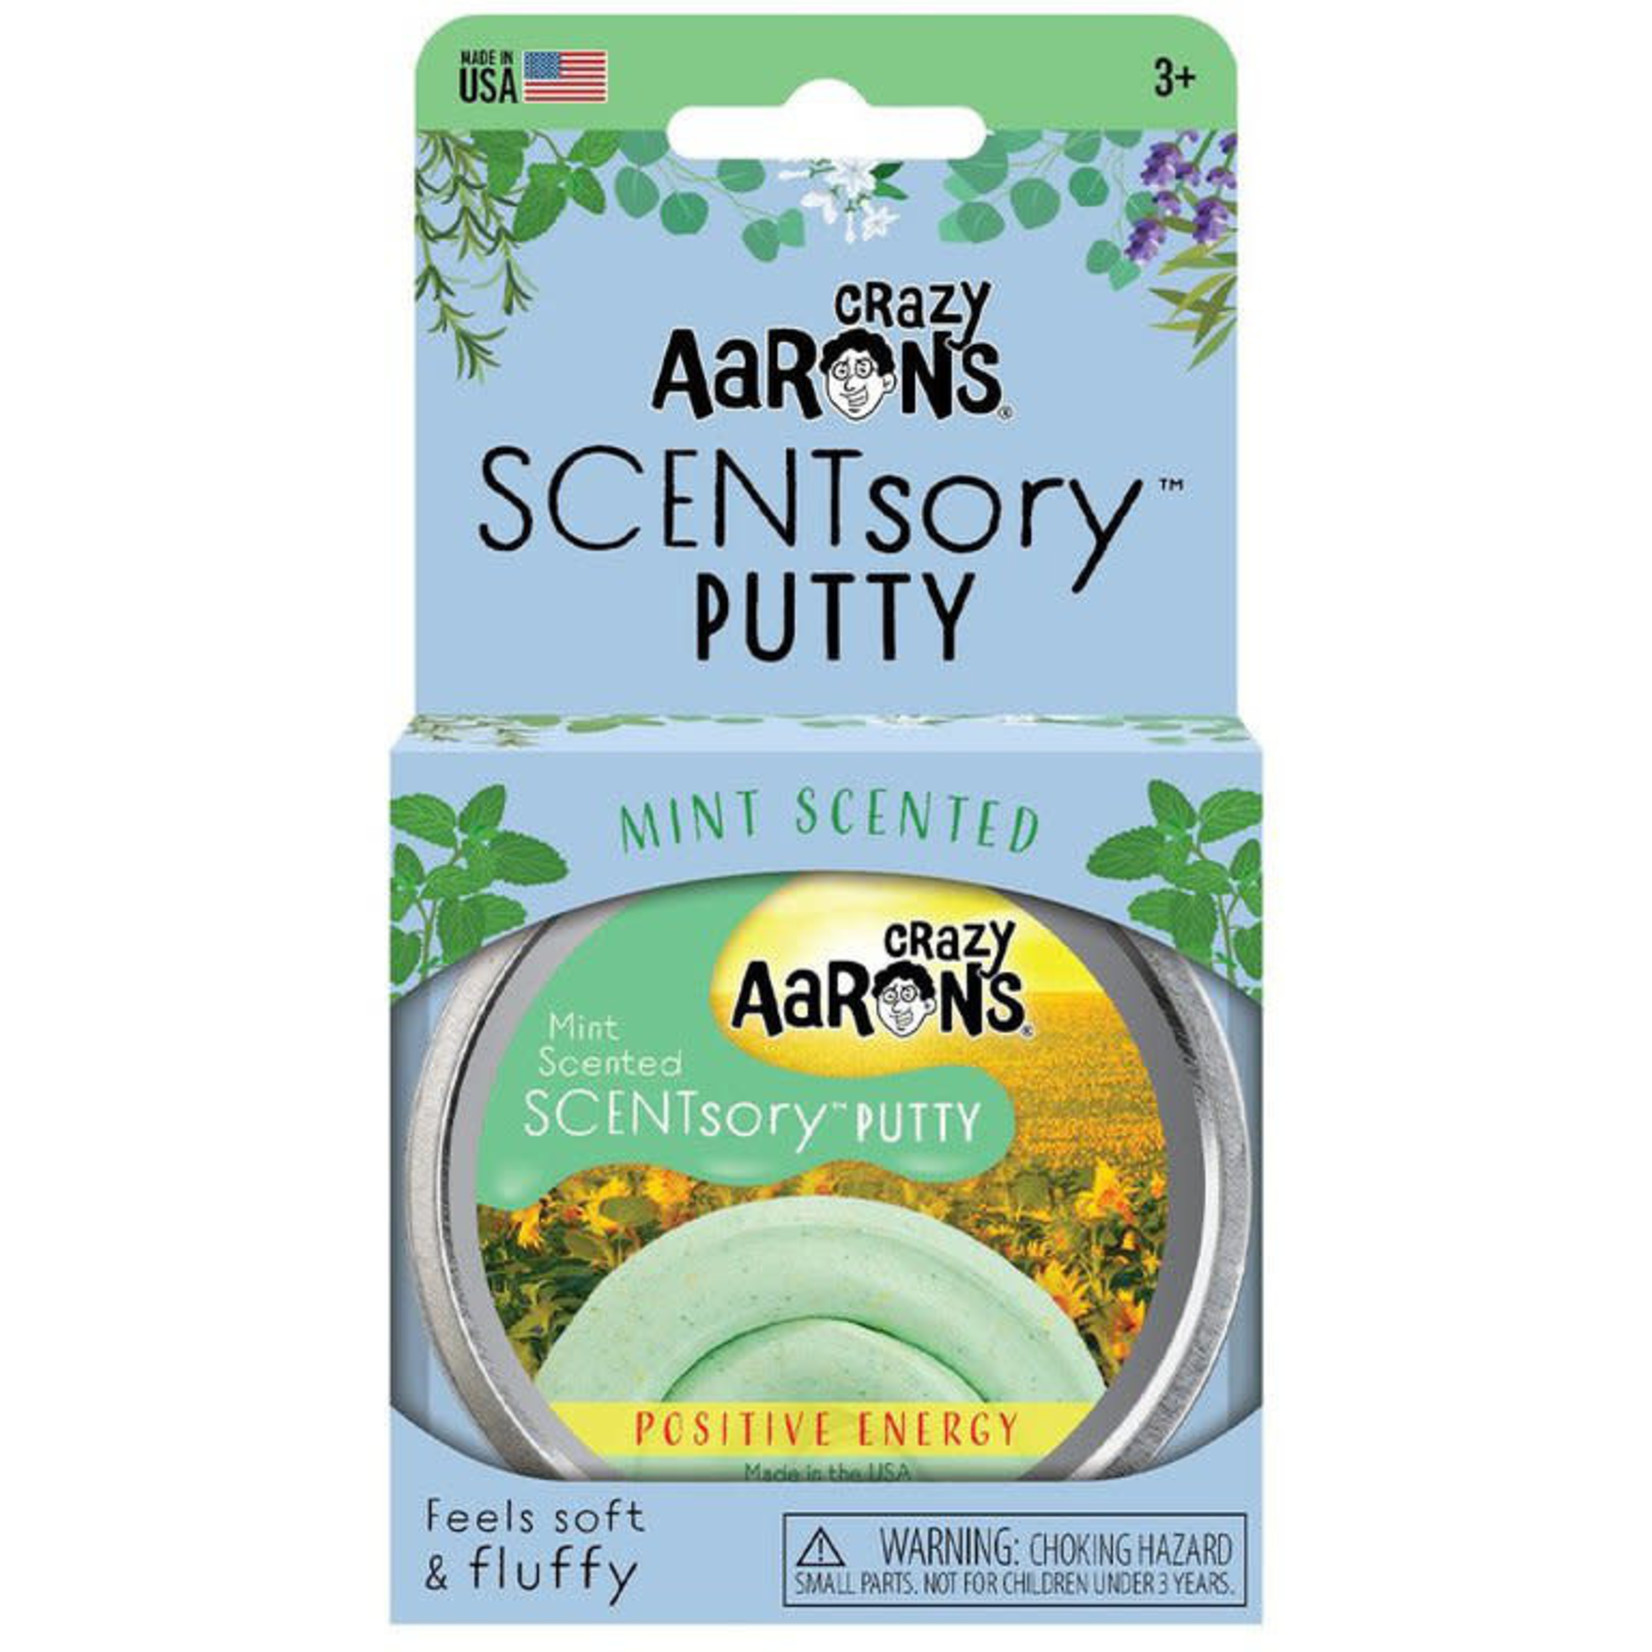 CRAZY AARON'S SCENTSORY PUTTY POSITIVE ENERGY